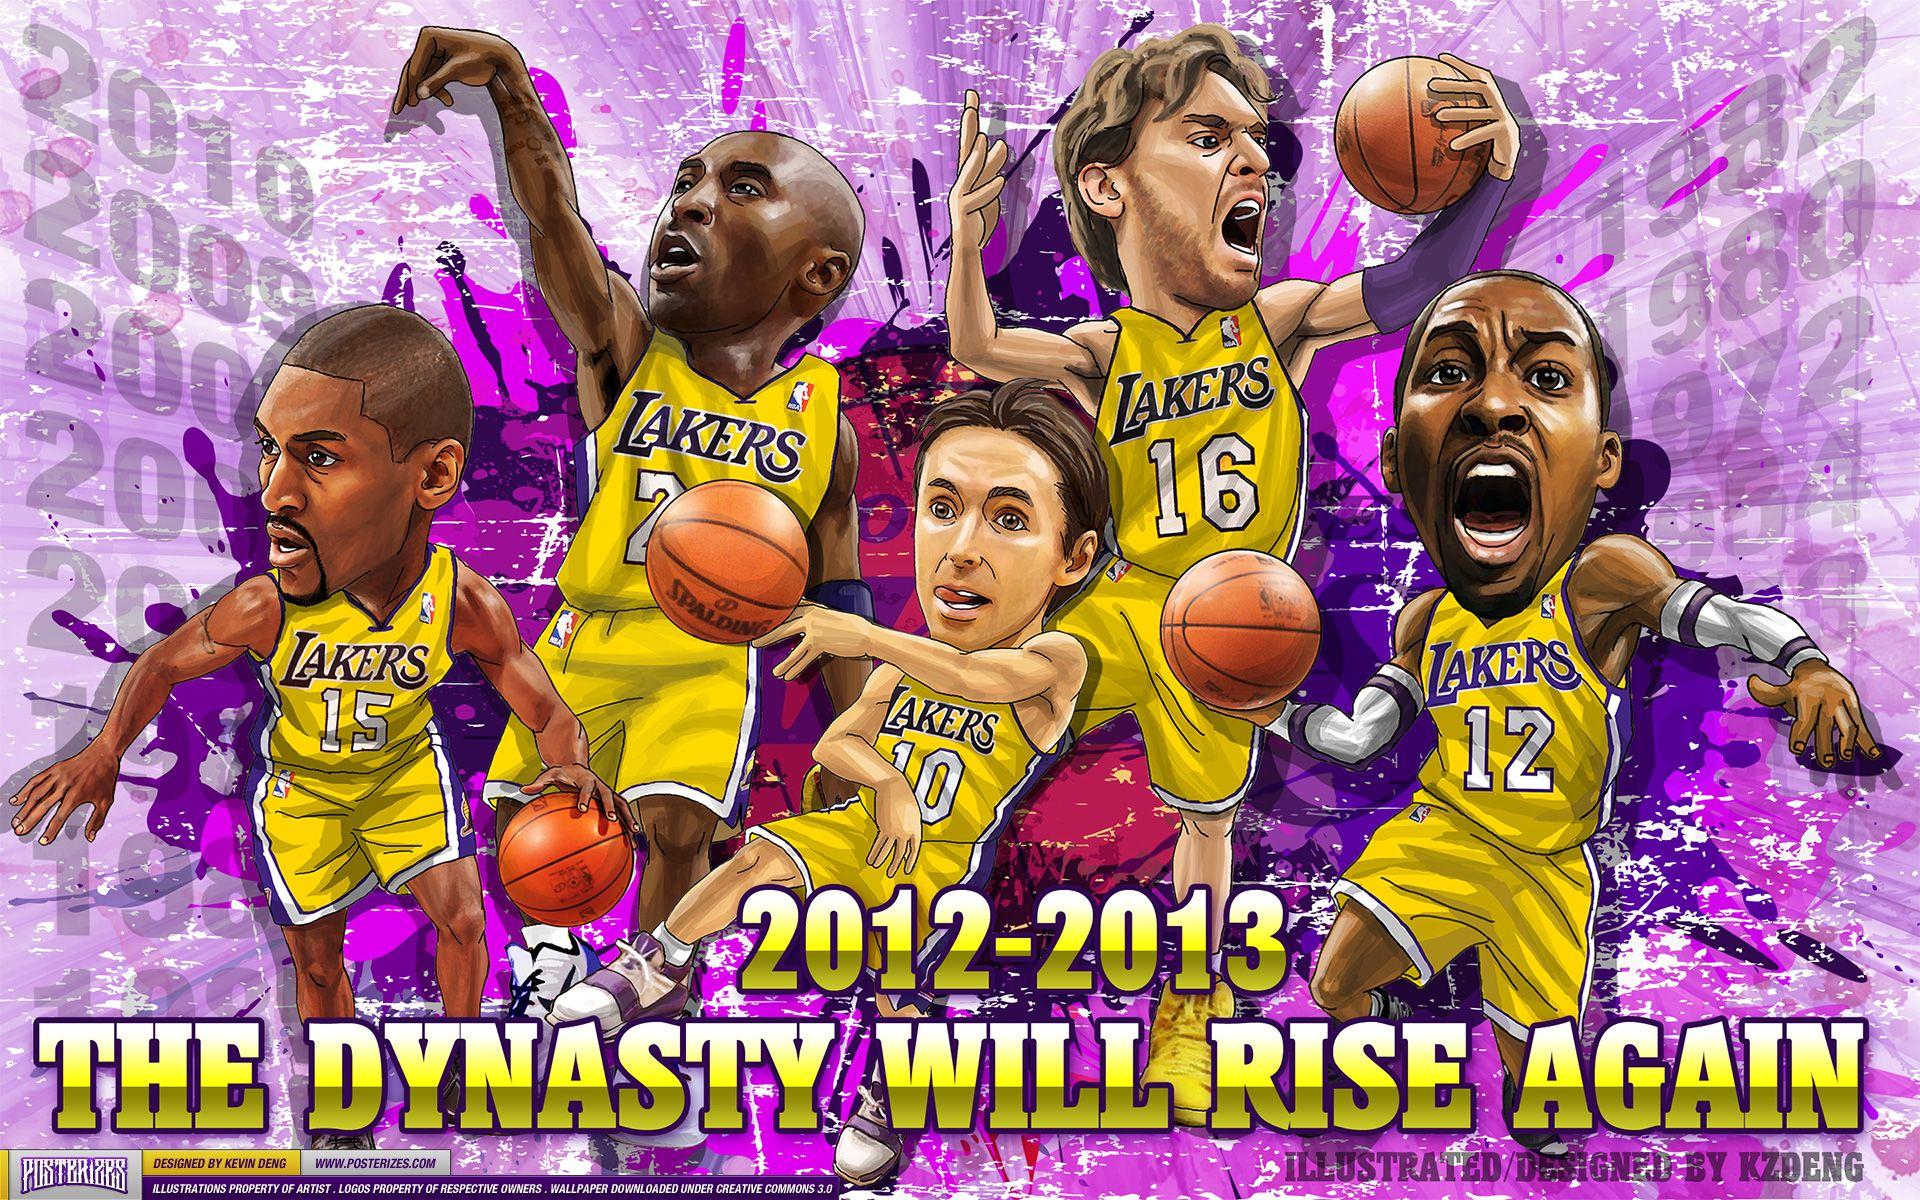 La Lakers Los Angeles Lakers 2012 2013 Dynasty Wallpaper Lakers Team Los Angeles Lakers Lakers Vs